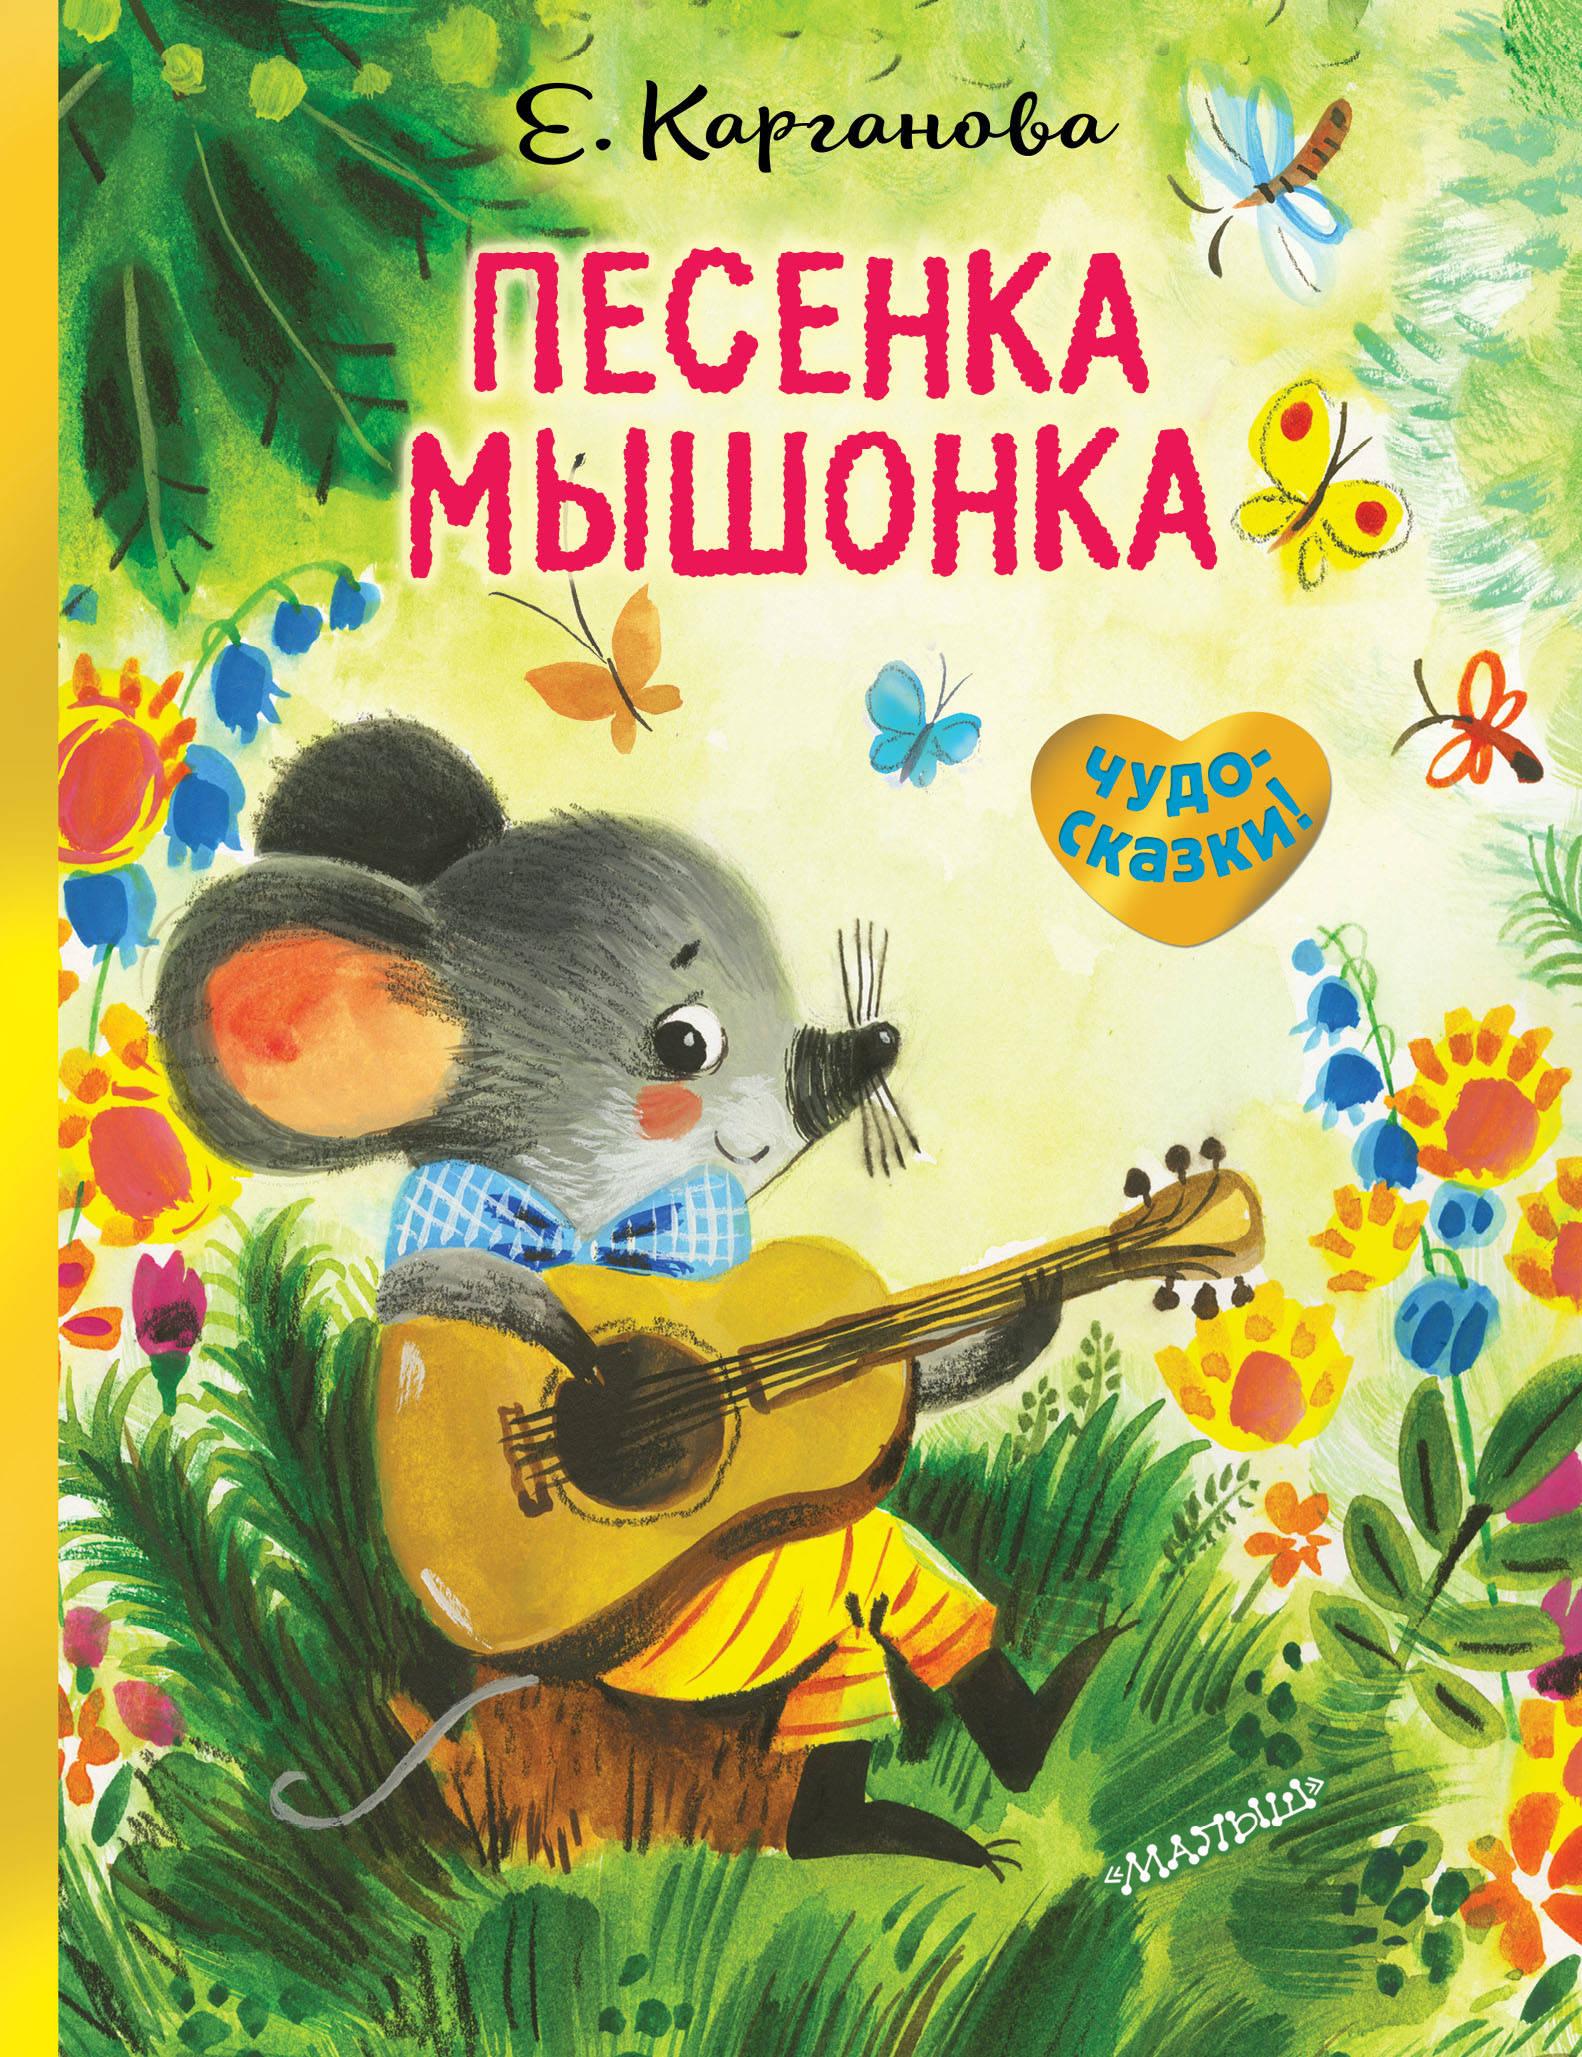 Песенка Мышонка